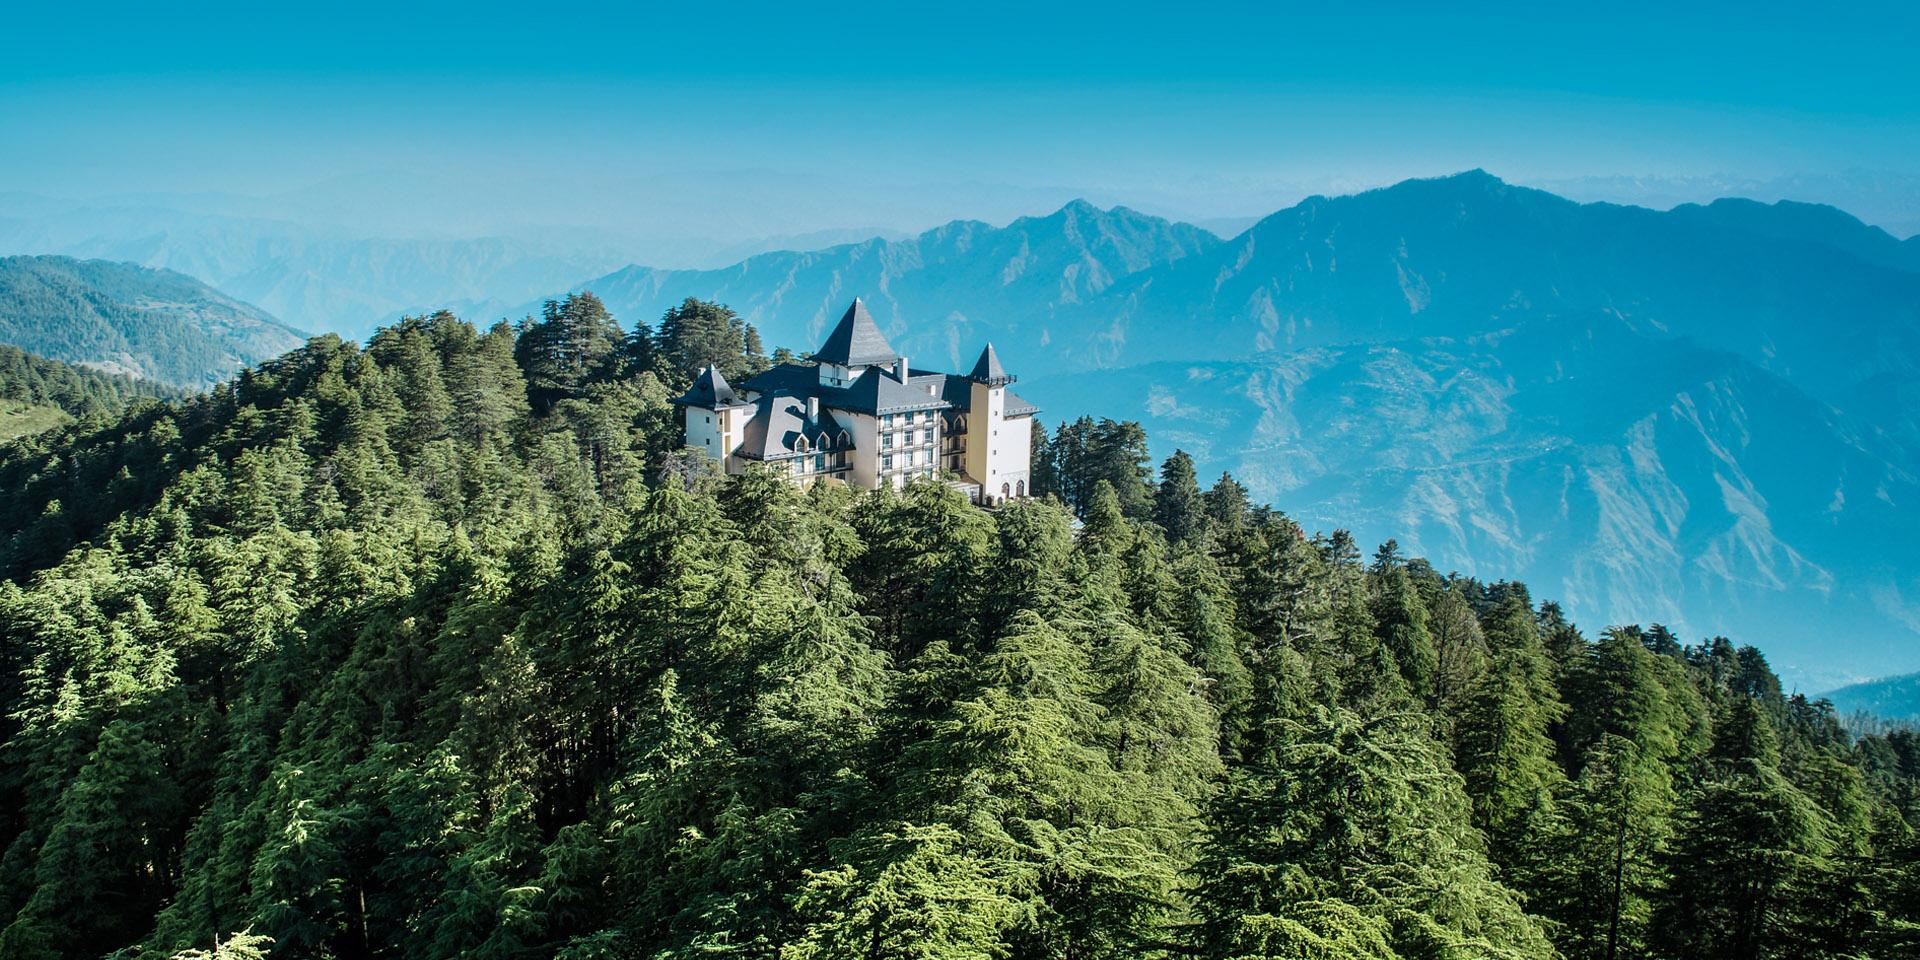 http://www.oberoihotels.com/